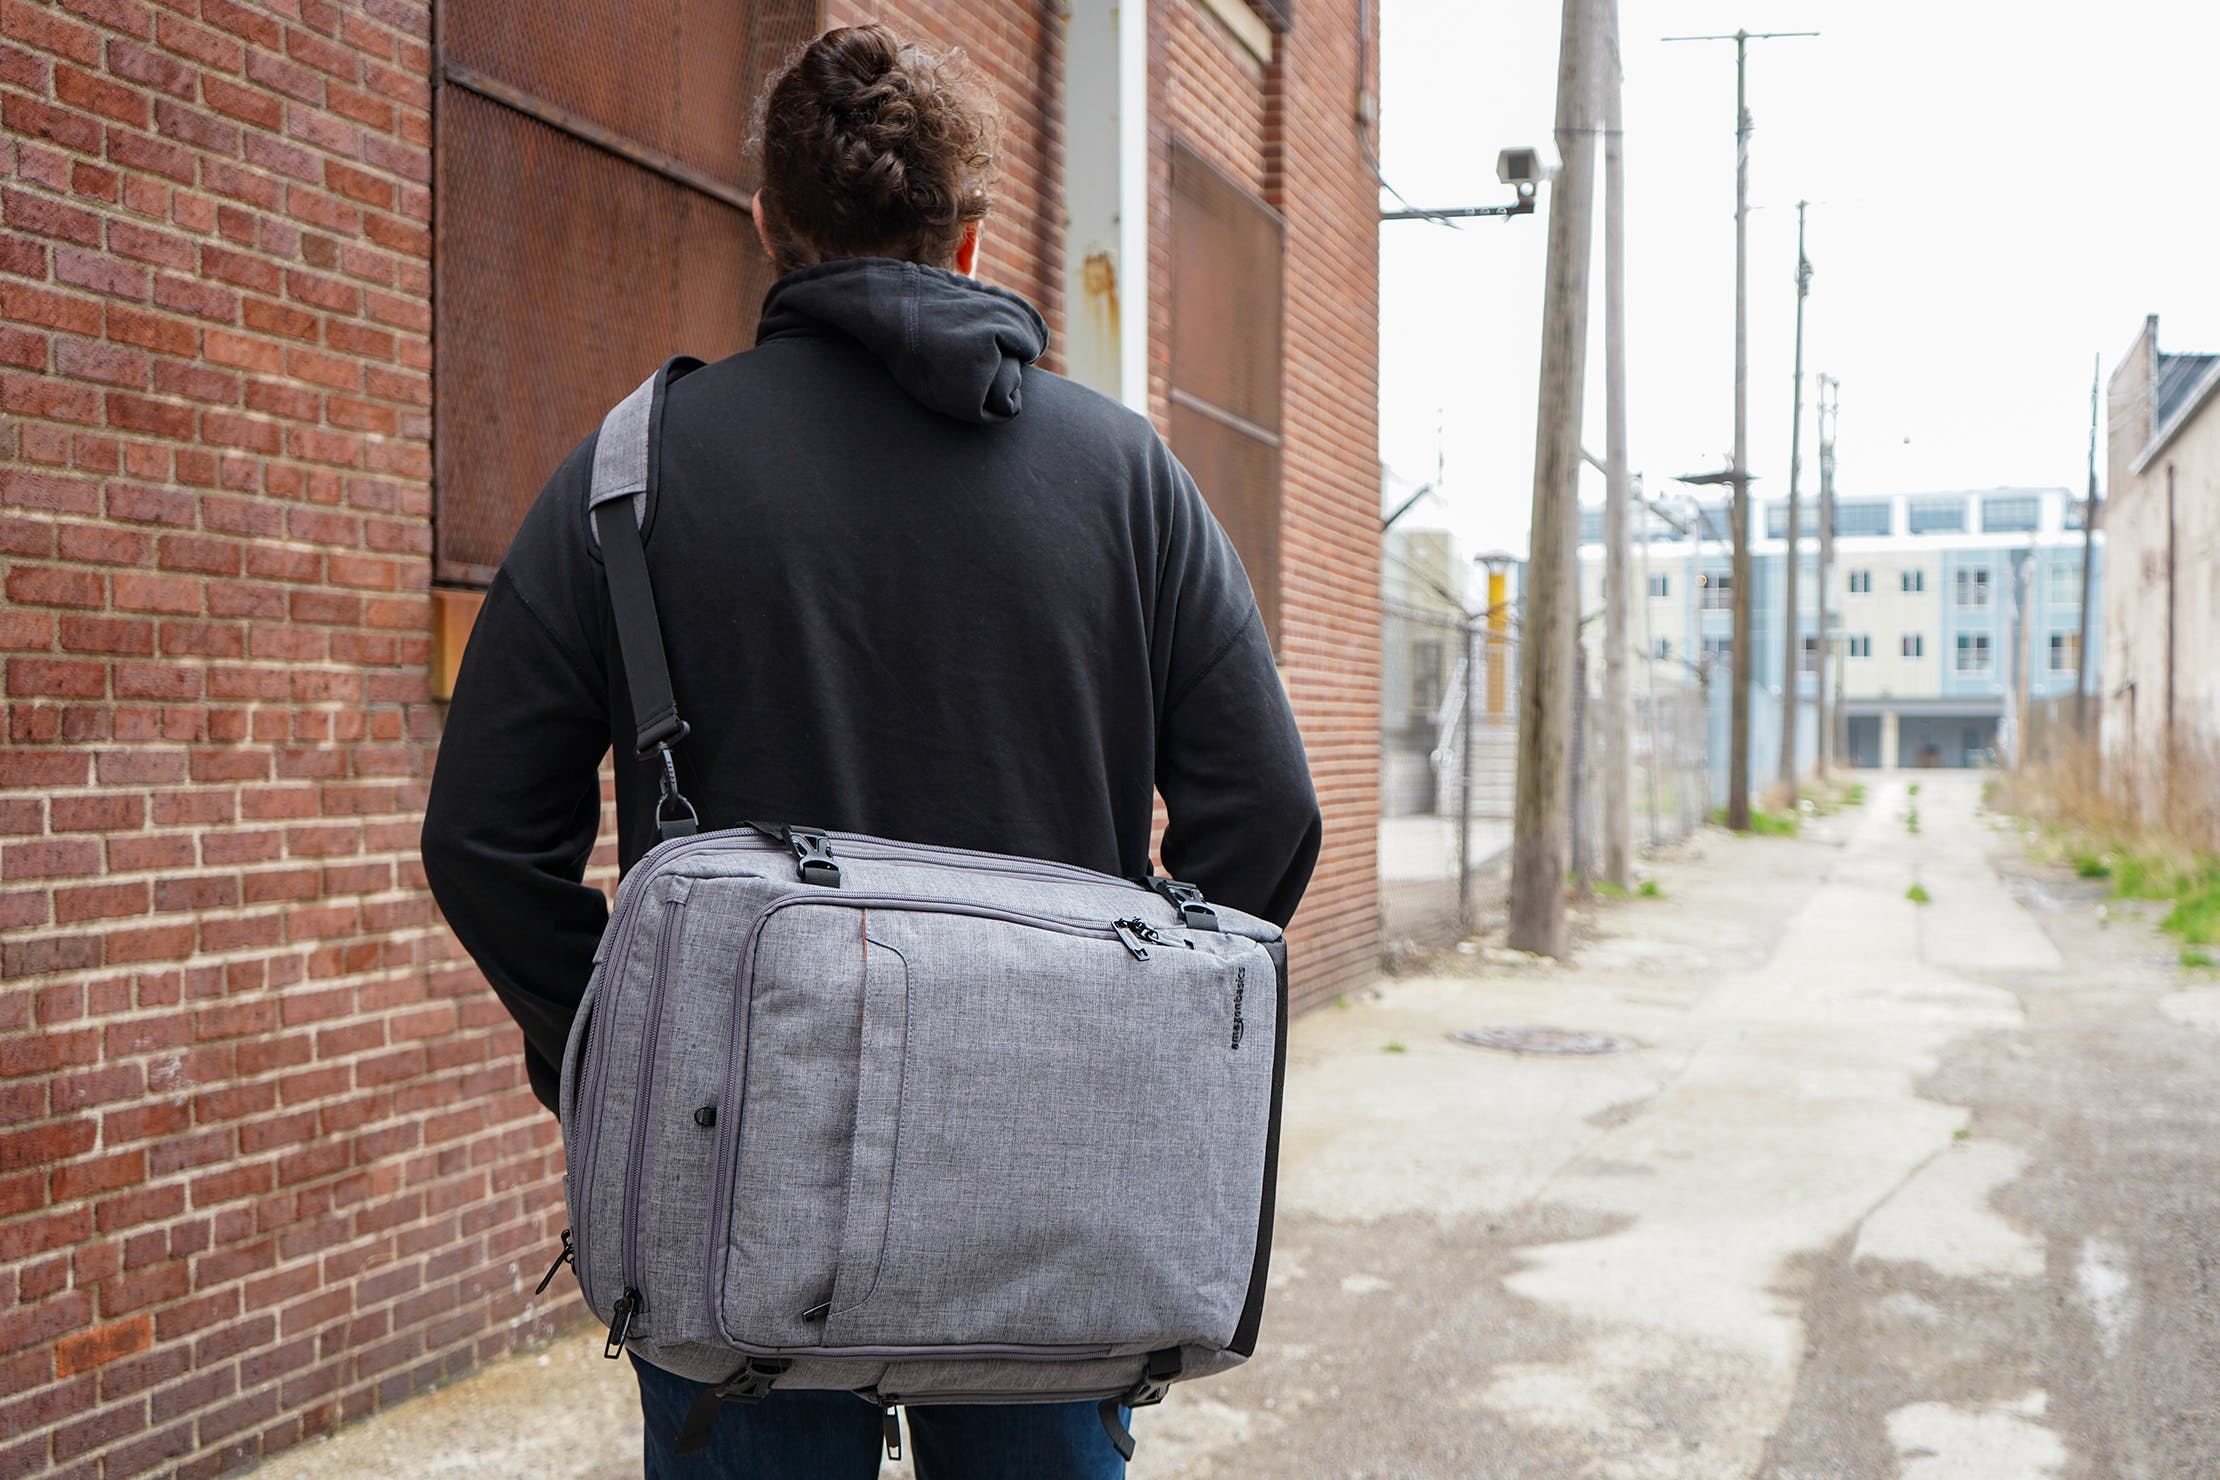 AmazonBasics Slim Travel Backpack Weekender Worn As A Messenger Bag